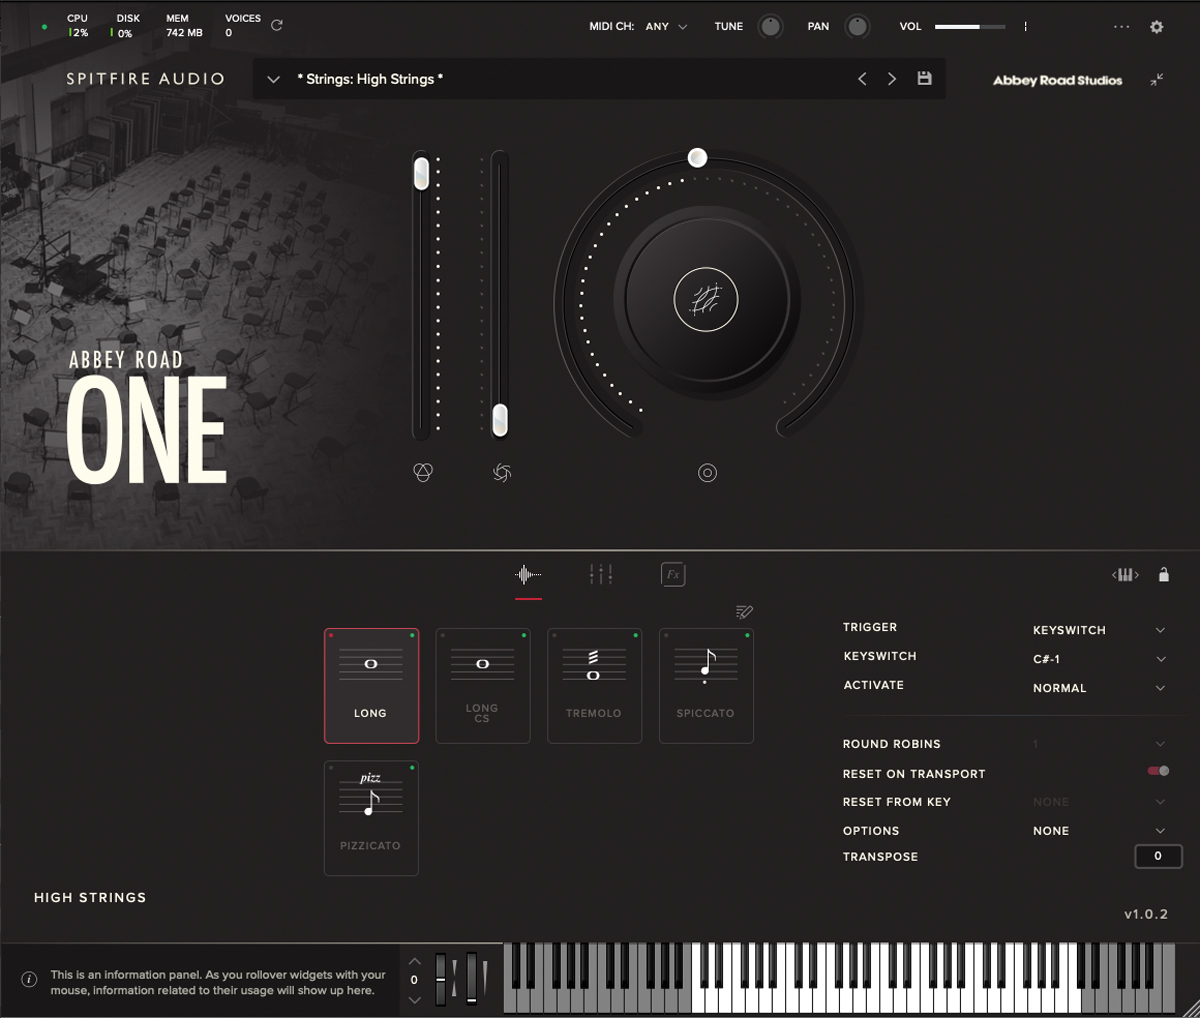 SPITFIRE AUDIOとアビイ・ロード・スタジオがタッグを組み、オーケストラ音源Abbey Road One: OrchestralFoundationsをリリースした